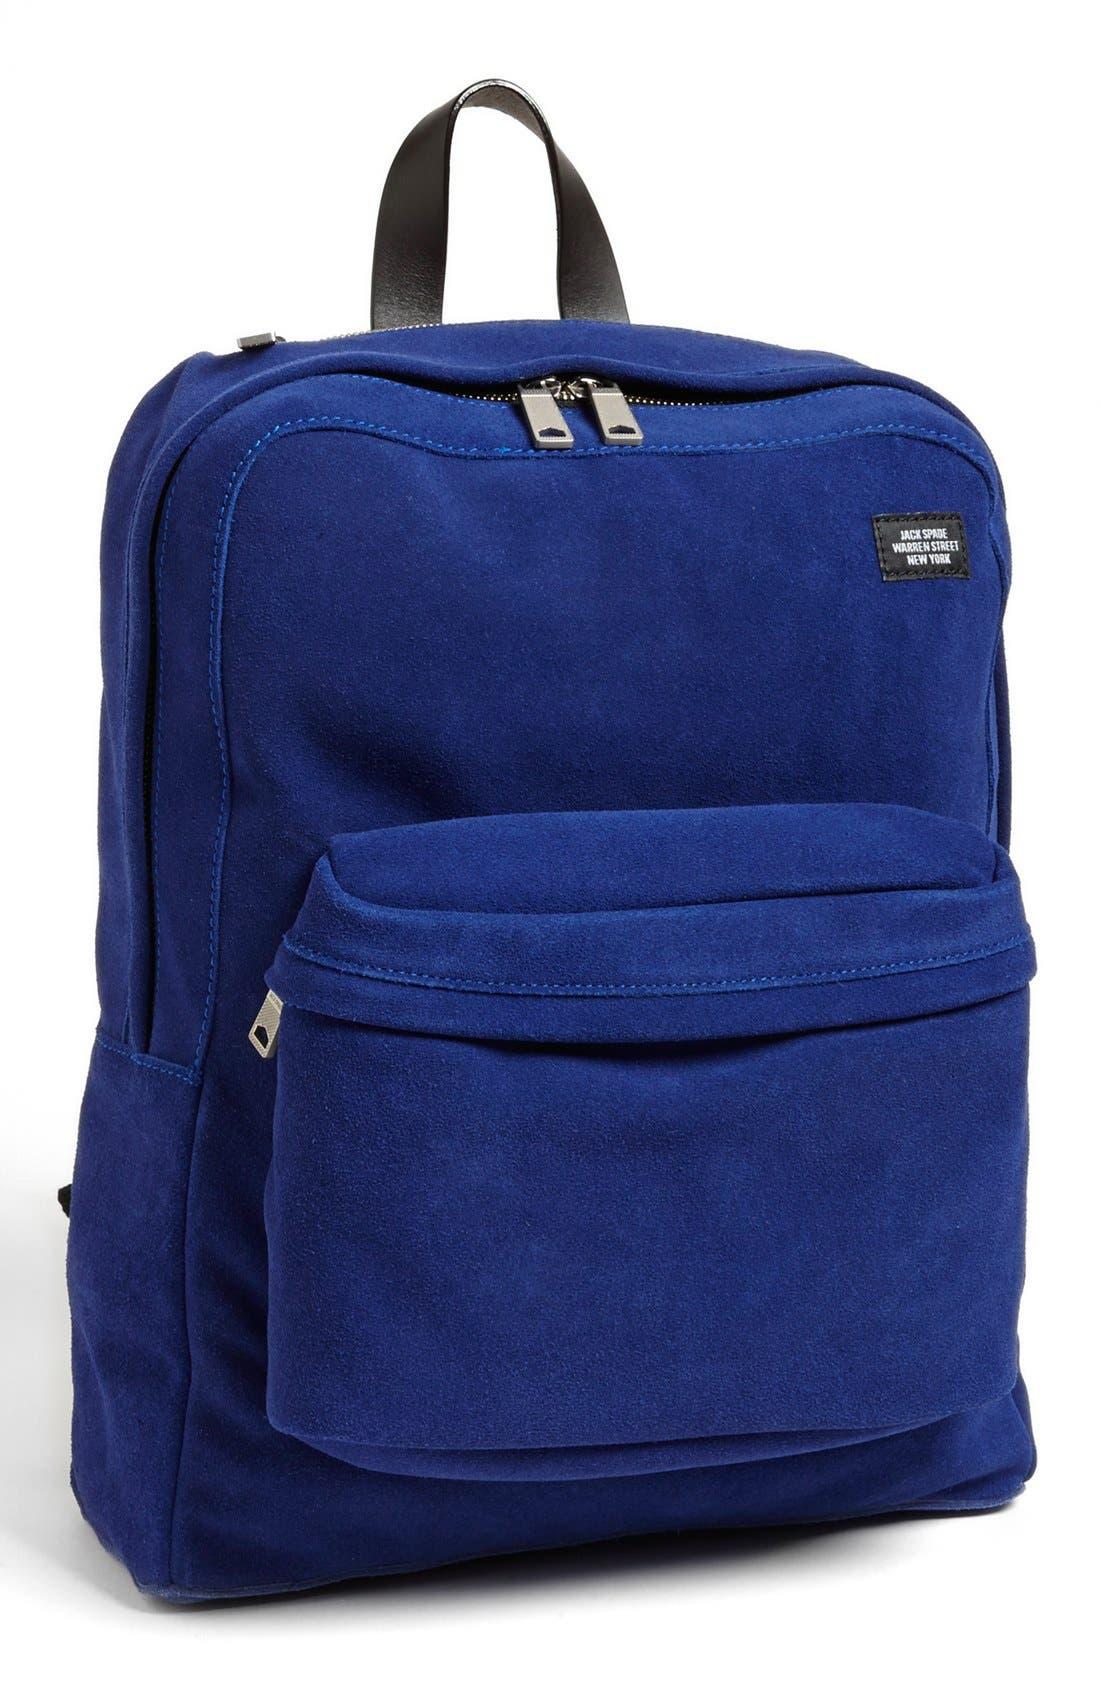 Alternate Image 1 Selected - Jack Spade 'Desert' Backpack